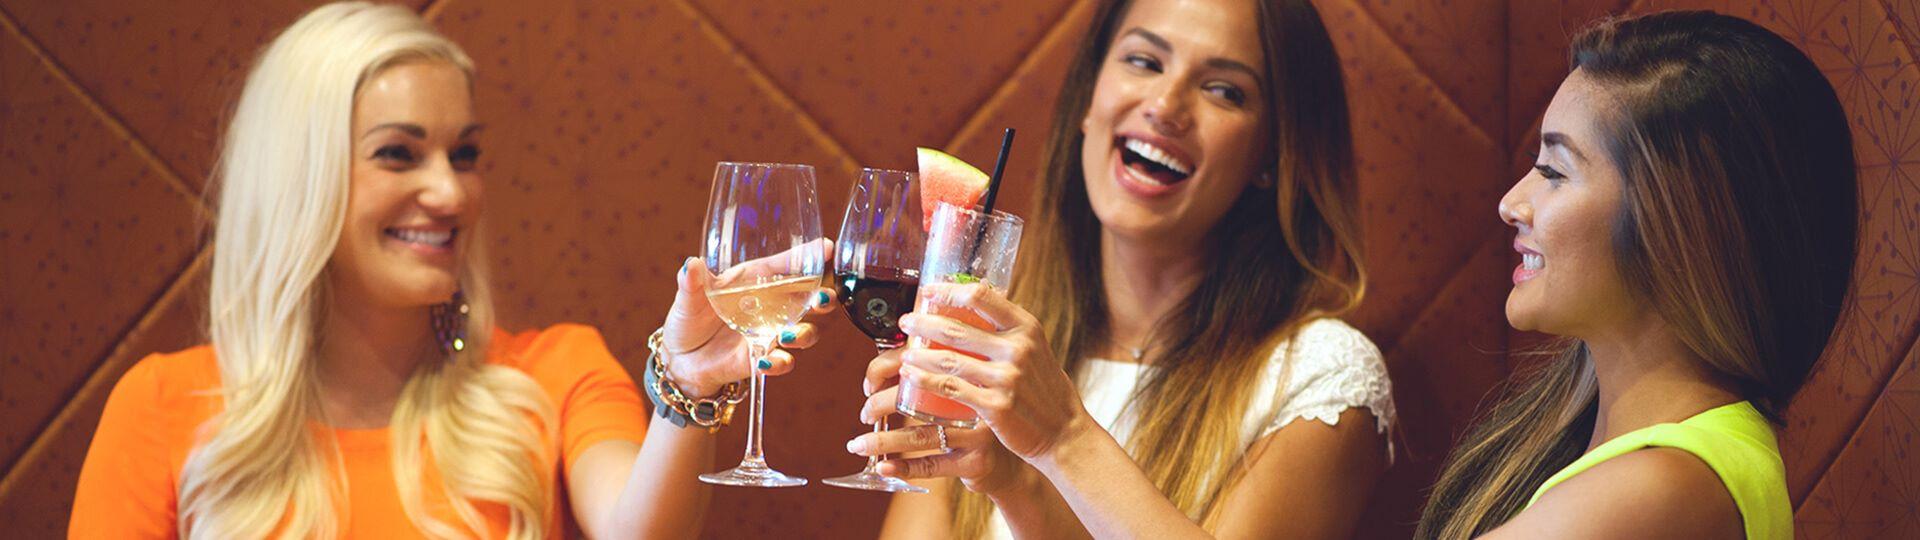 Luna Restaurant & Lounge, Florida - Special Offers